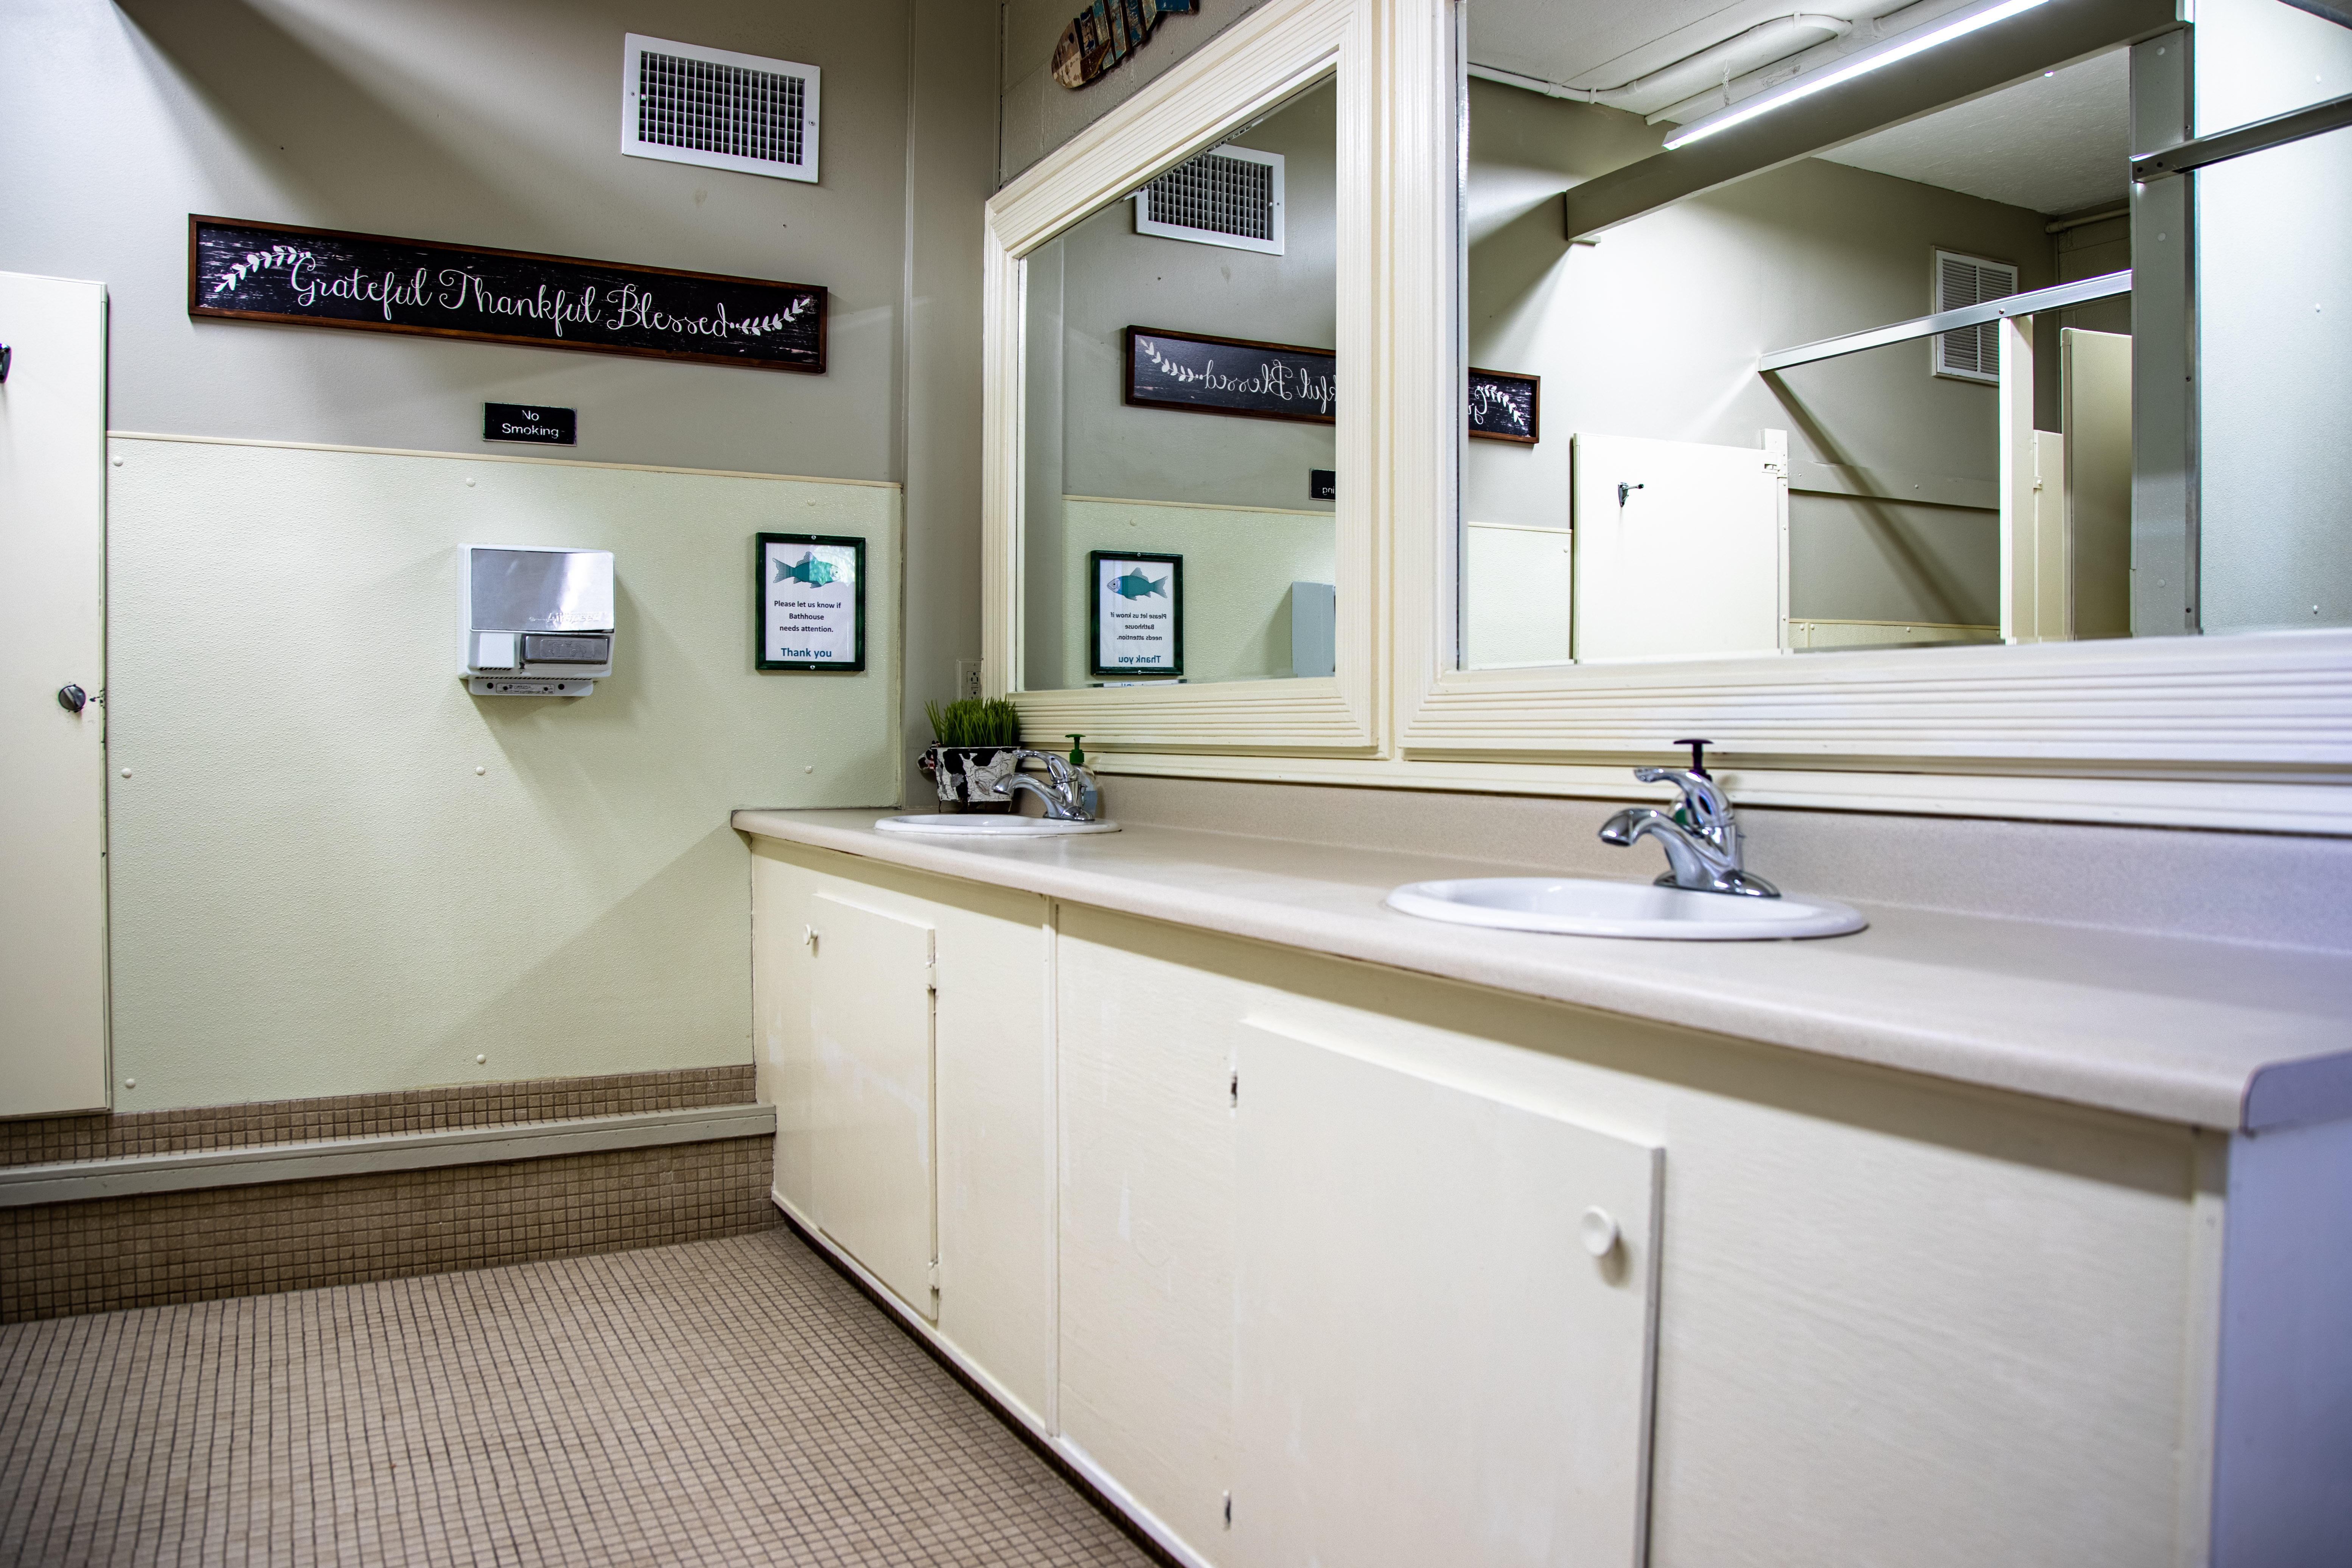 Climate controlled bathhouse.